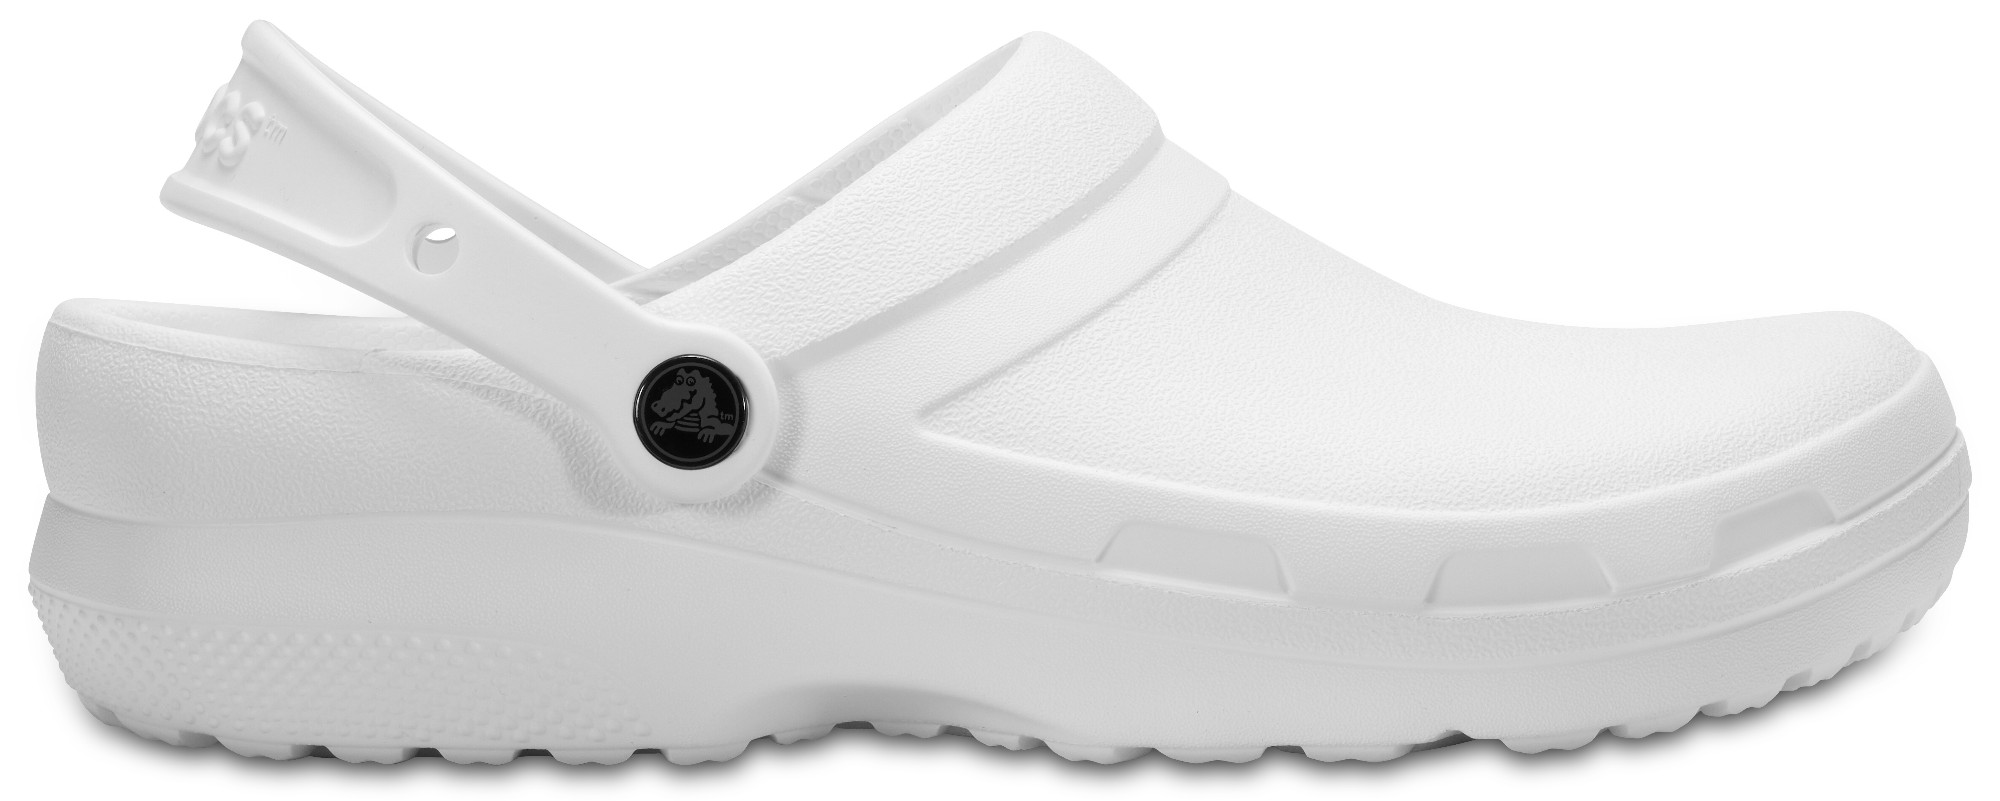 Crocs™ Specialist II Clog White 43,5